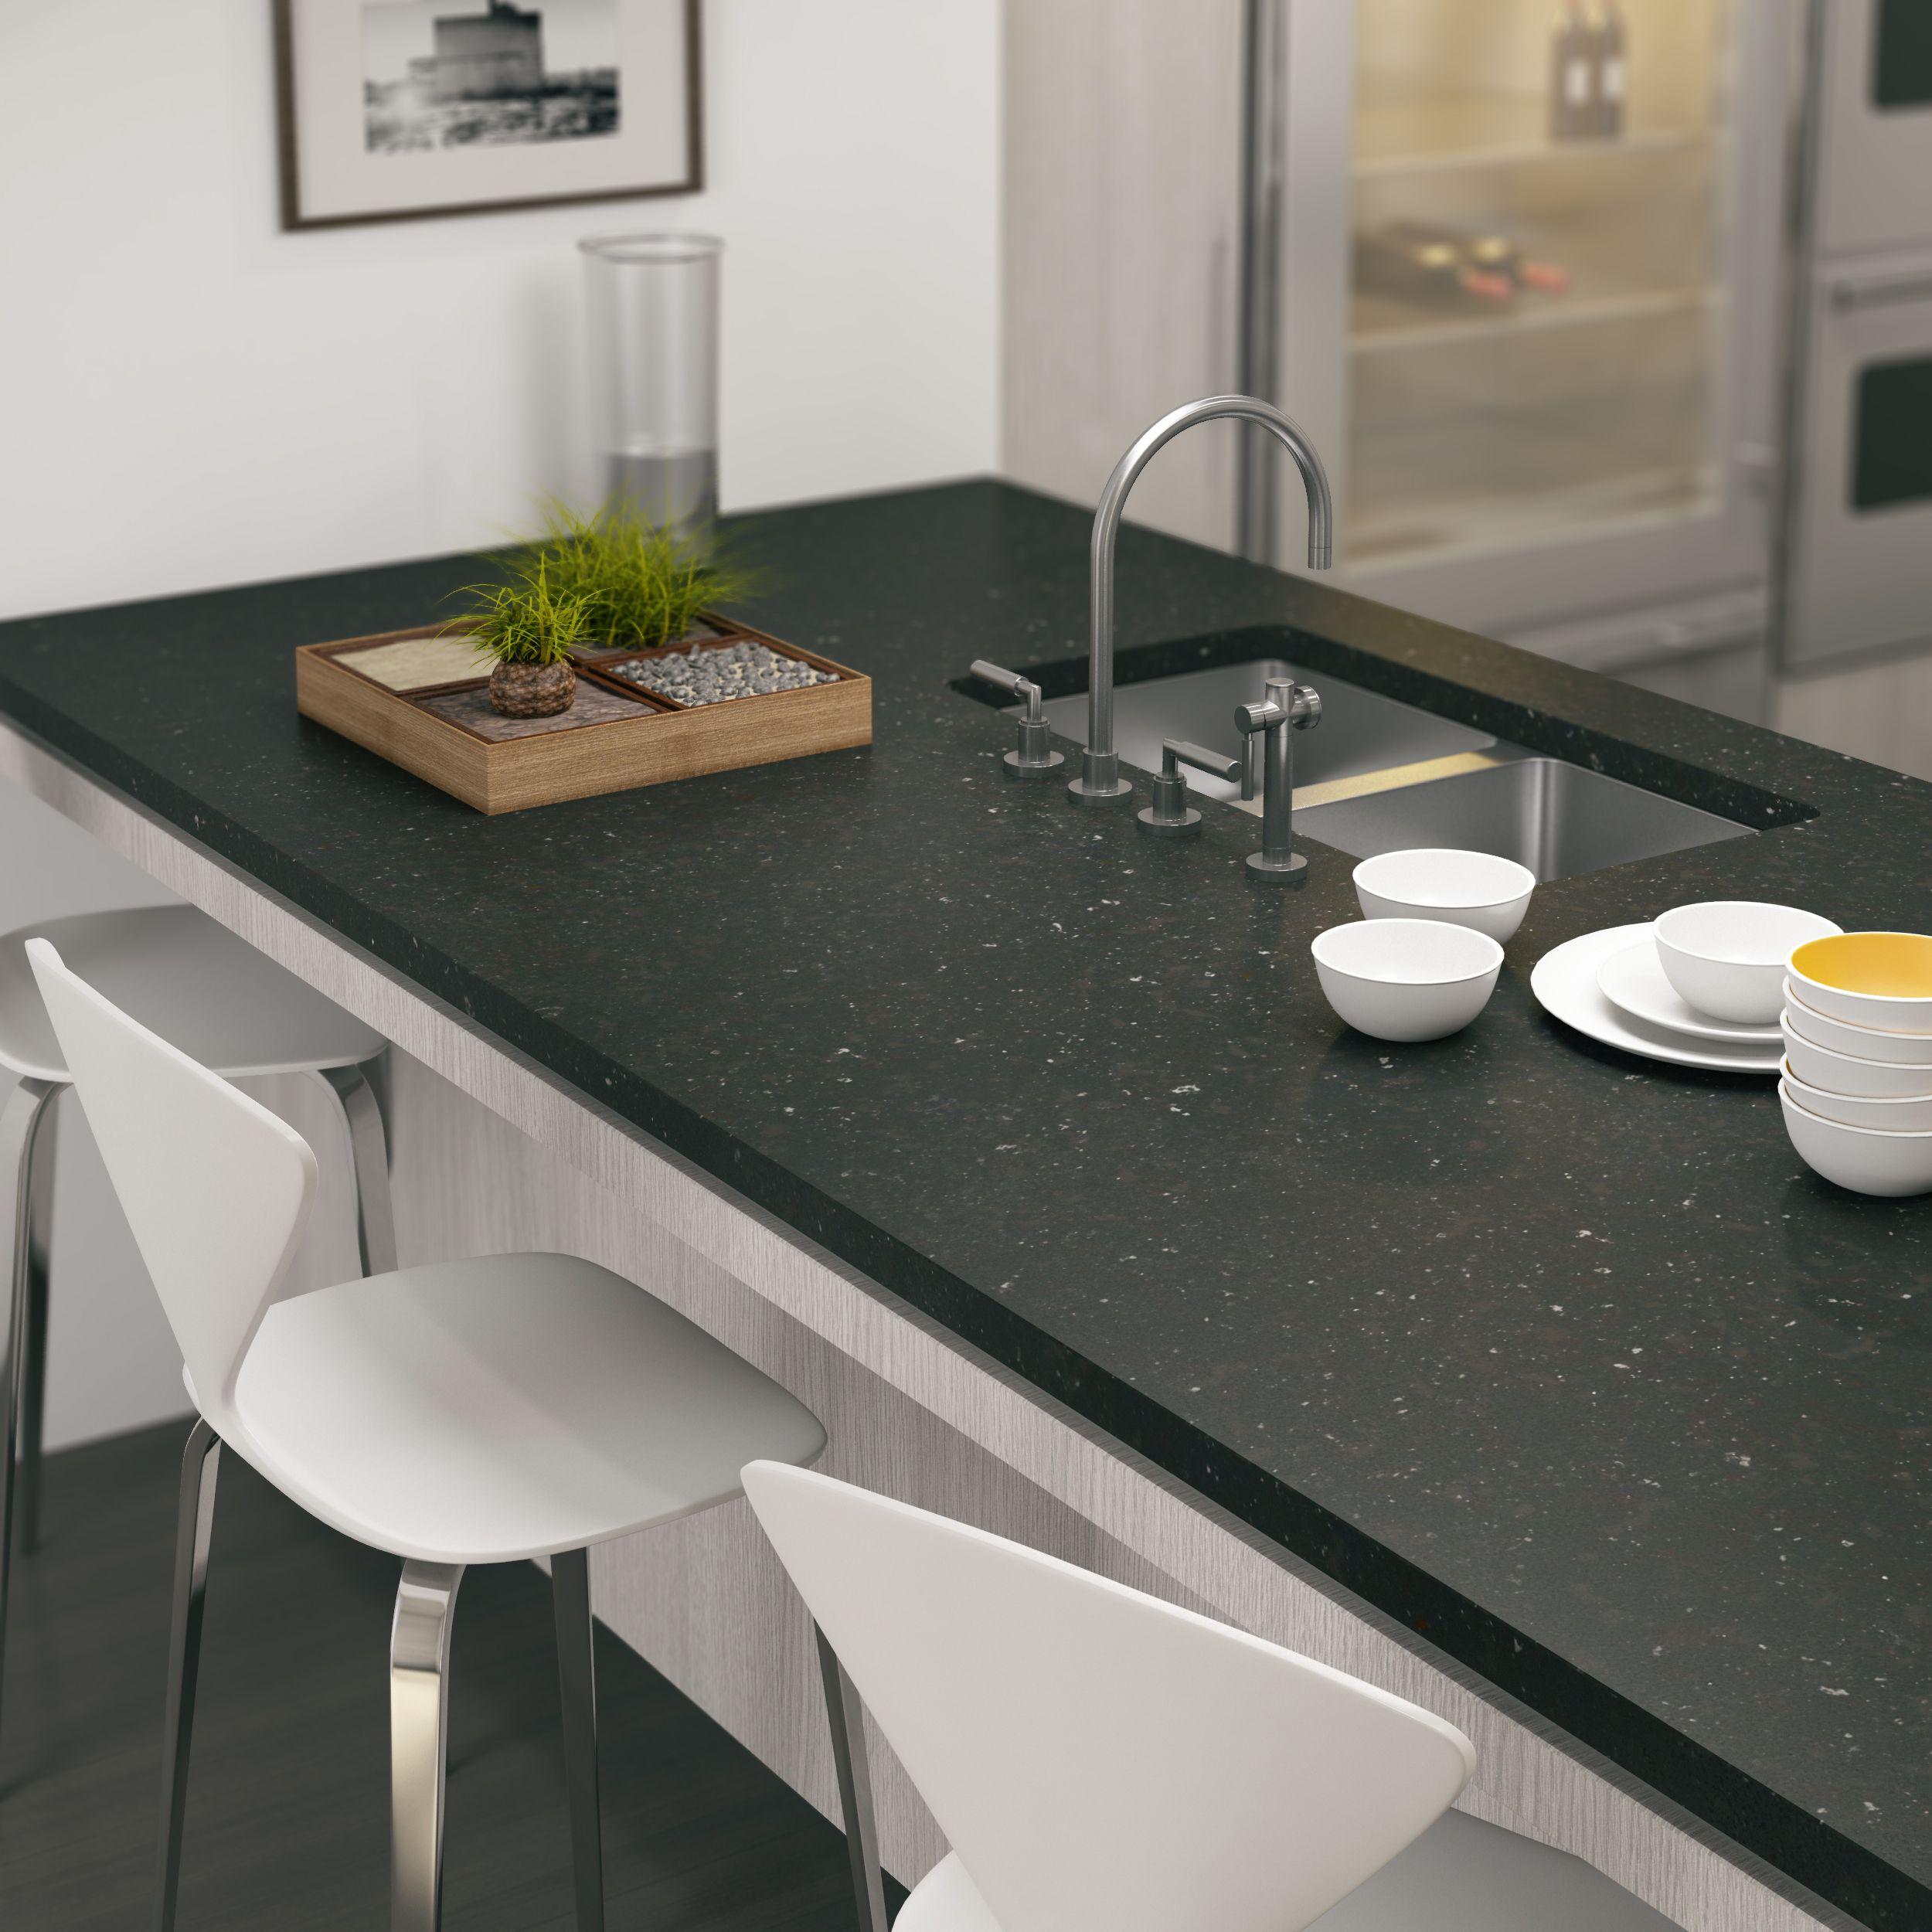 Küche Schilling | Silestone Arden Blue Quartz Keuken Nic En Bram Pinterest